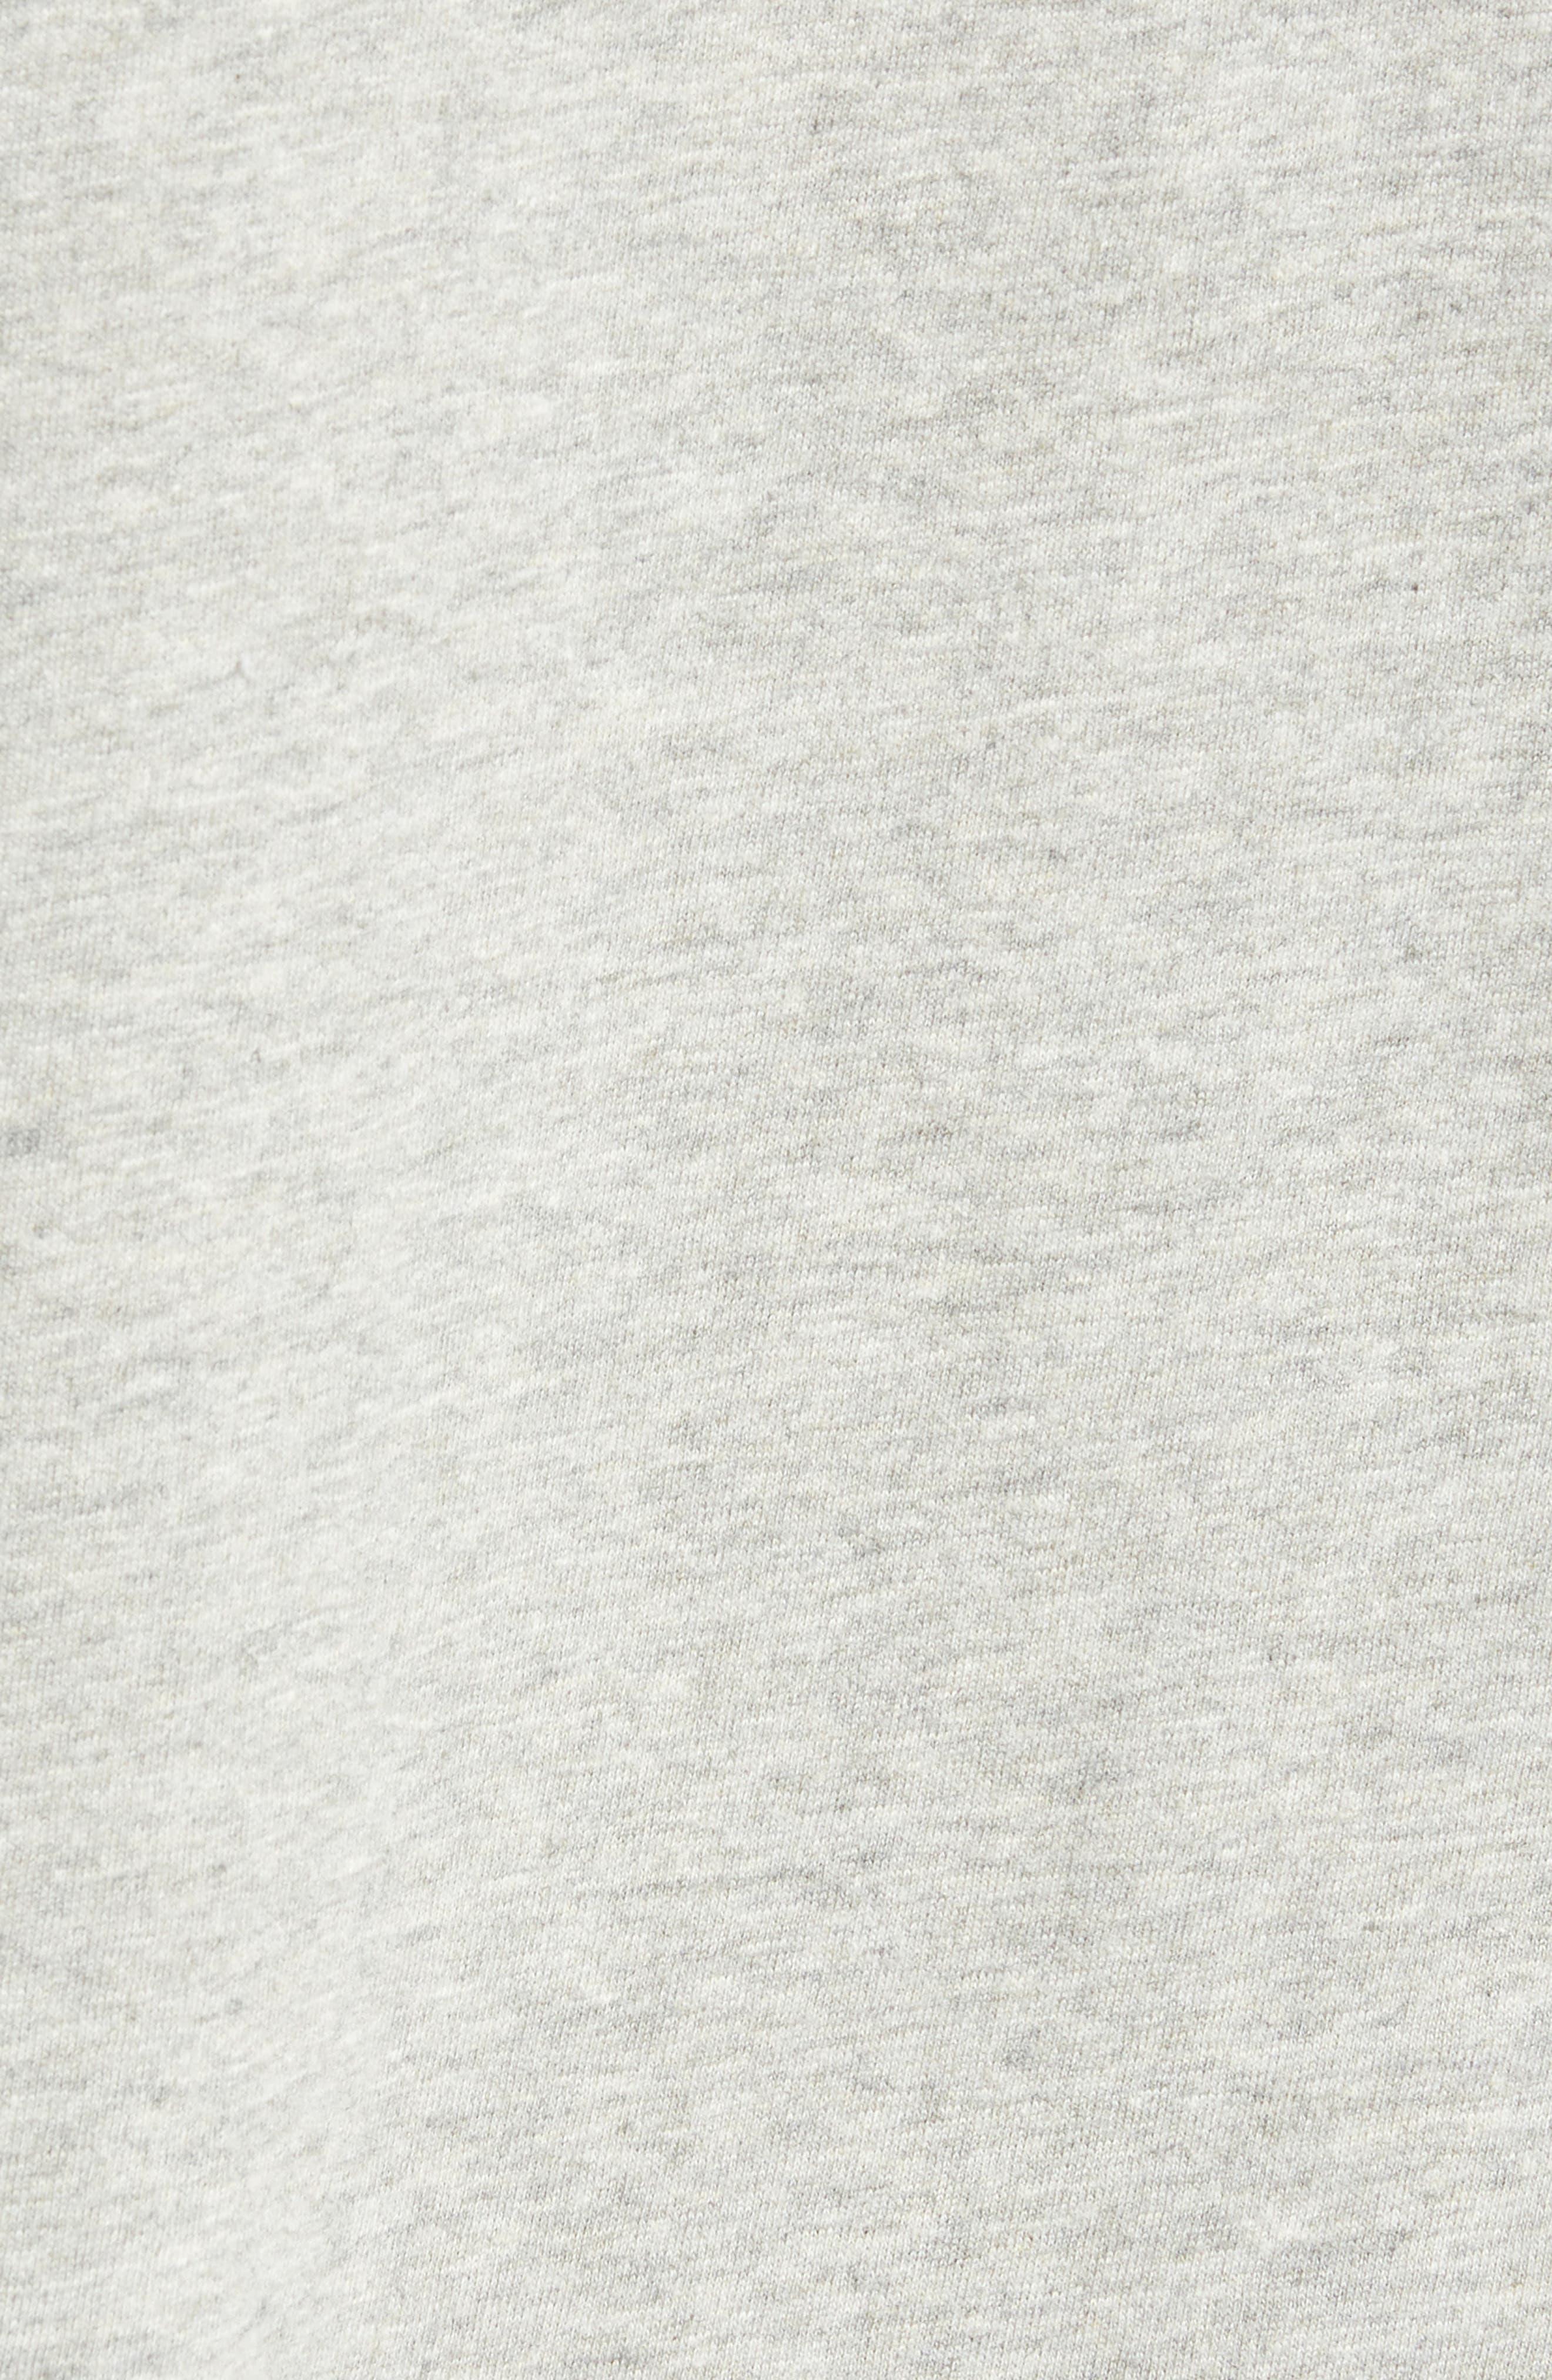 Motorcycle Regular Fit Cotton T-Shirt,                             Alternate thumbnail 5, color,                             GREY MELANGE BLACK